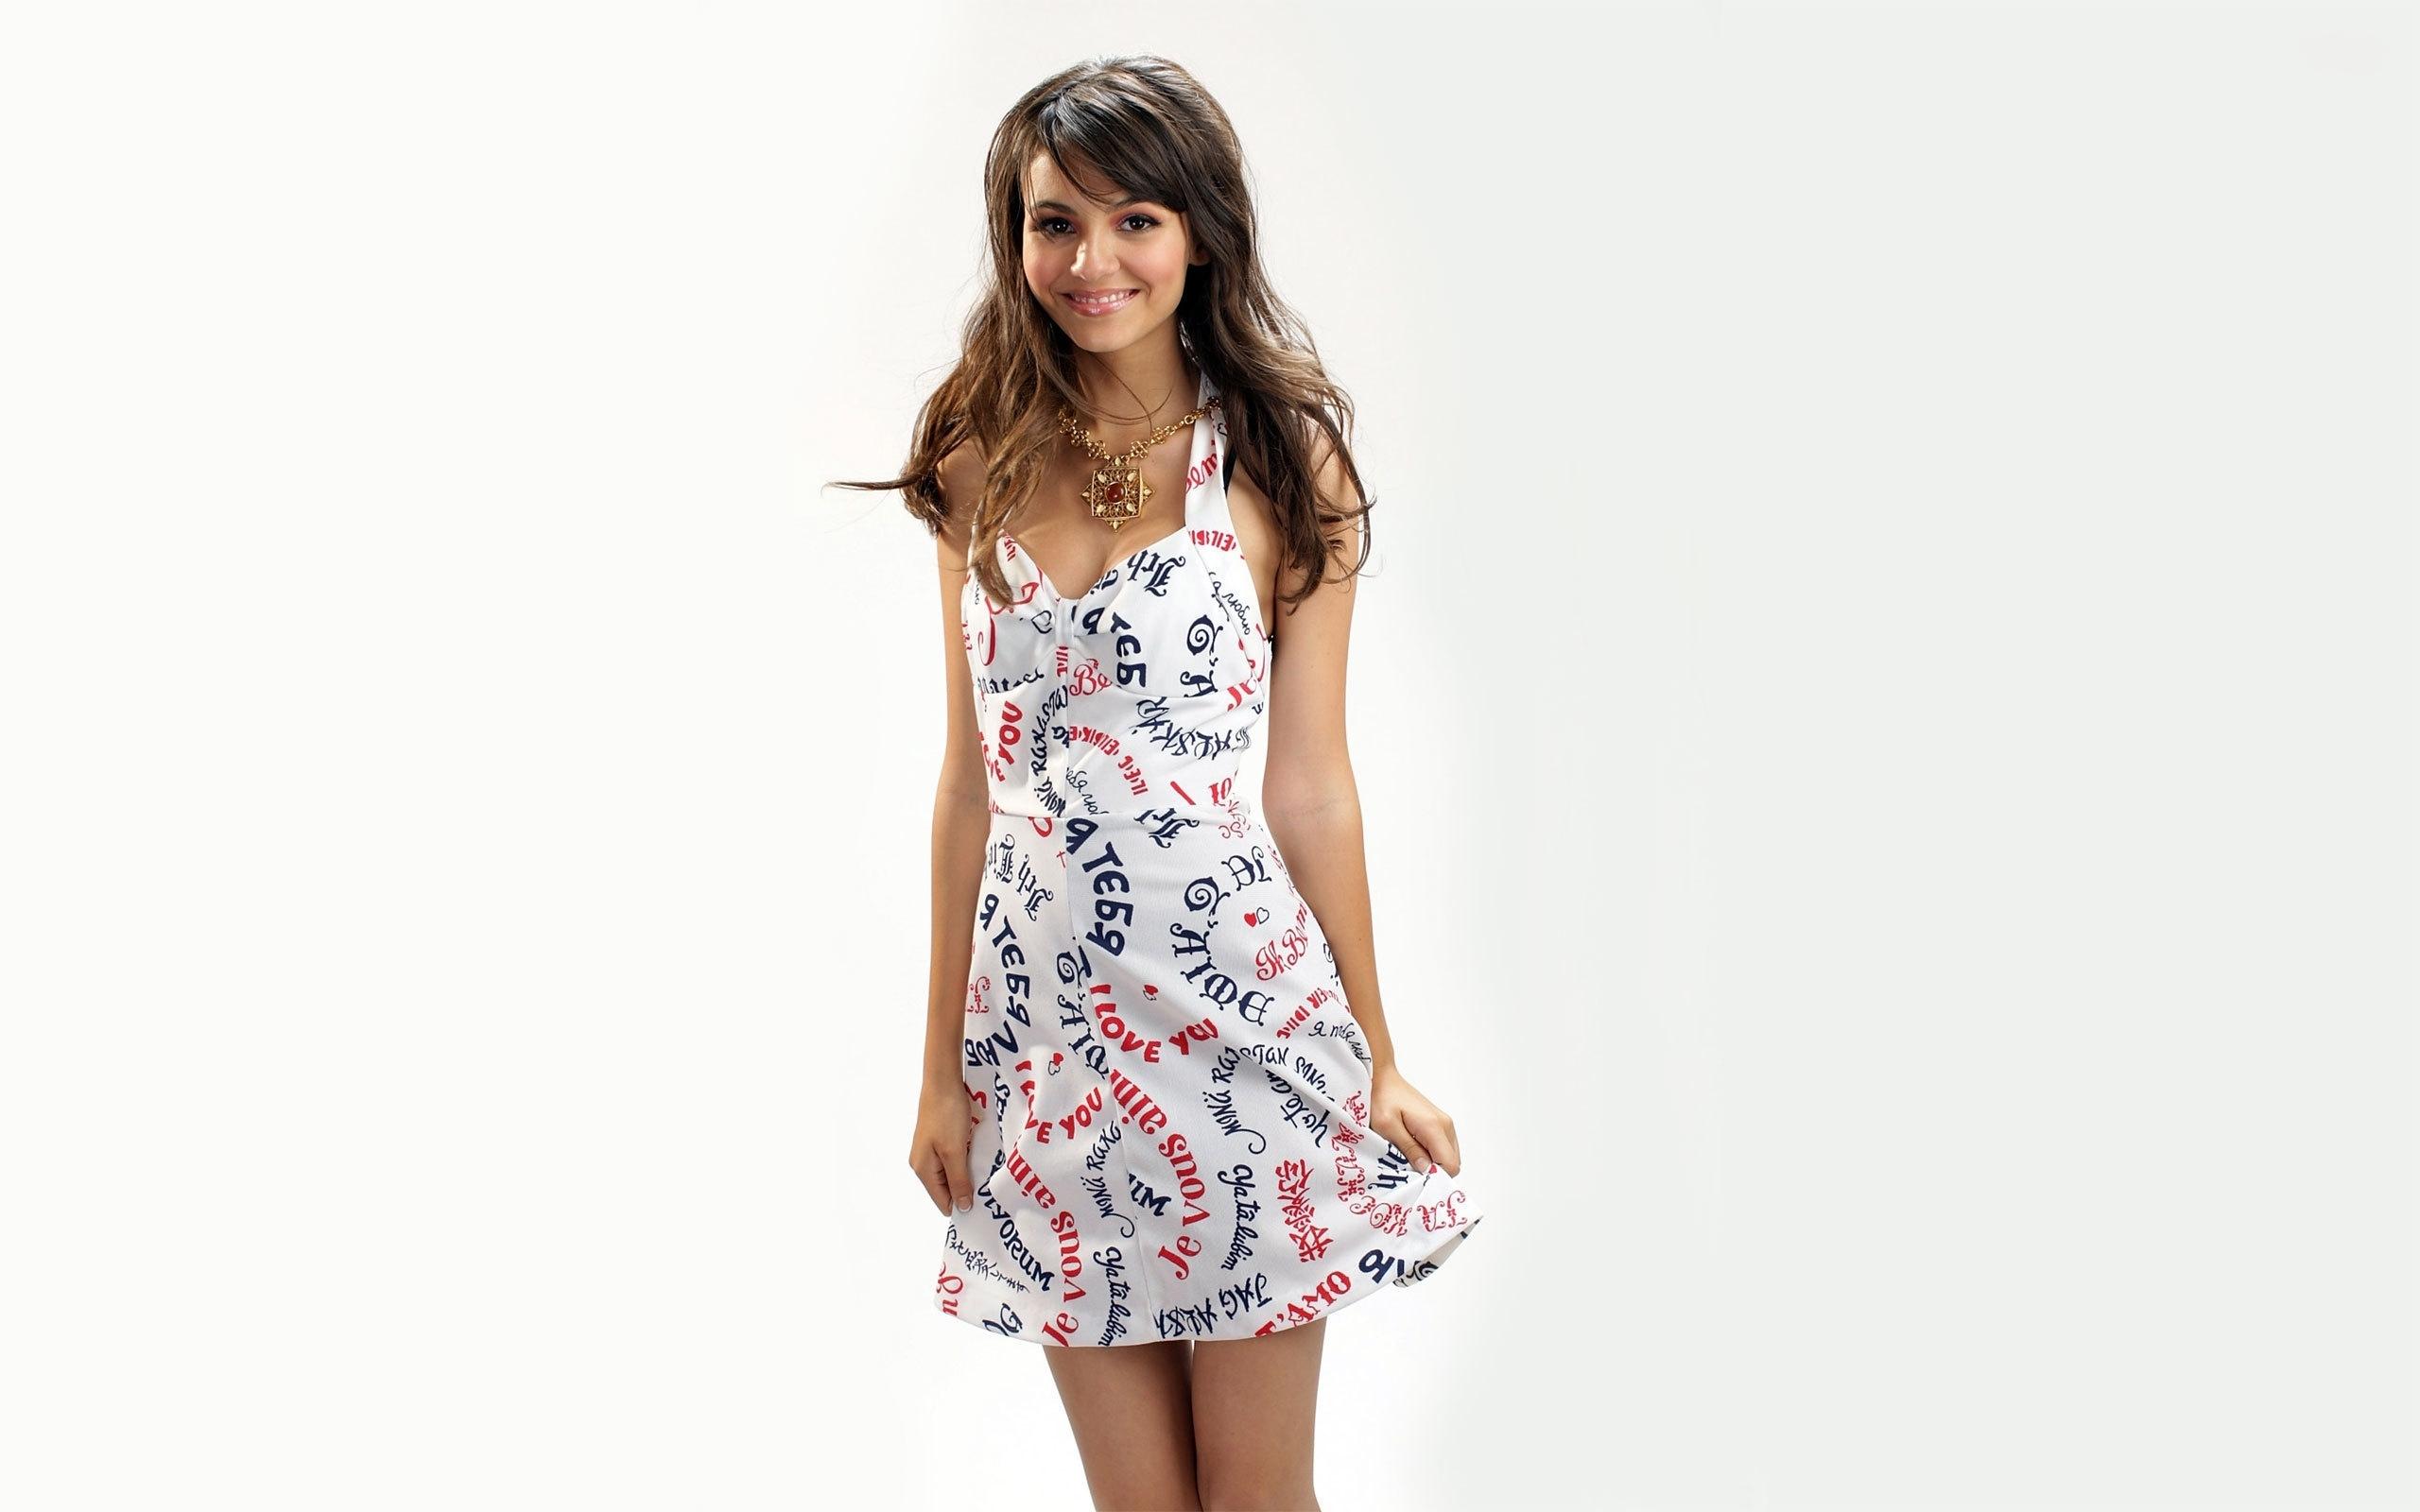 Hintergrundbilder : Brünette, Kleid, Muster, Mode, Frühling ...